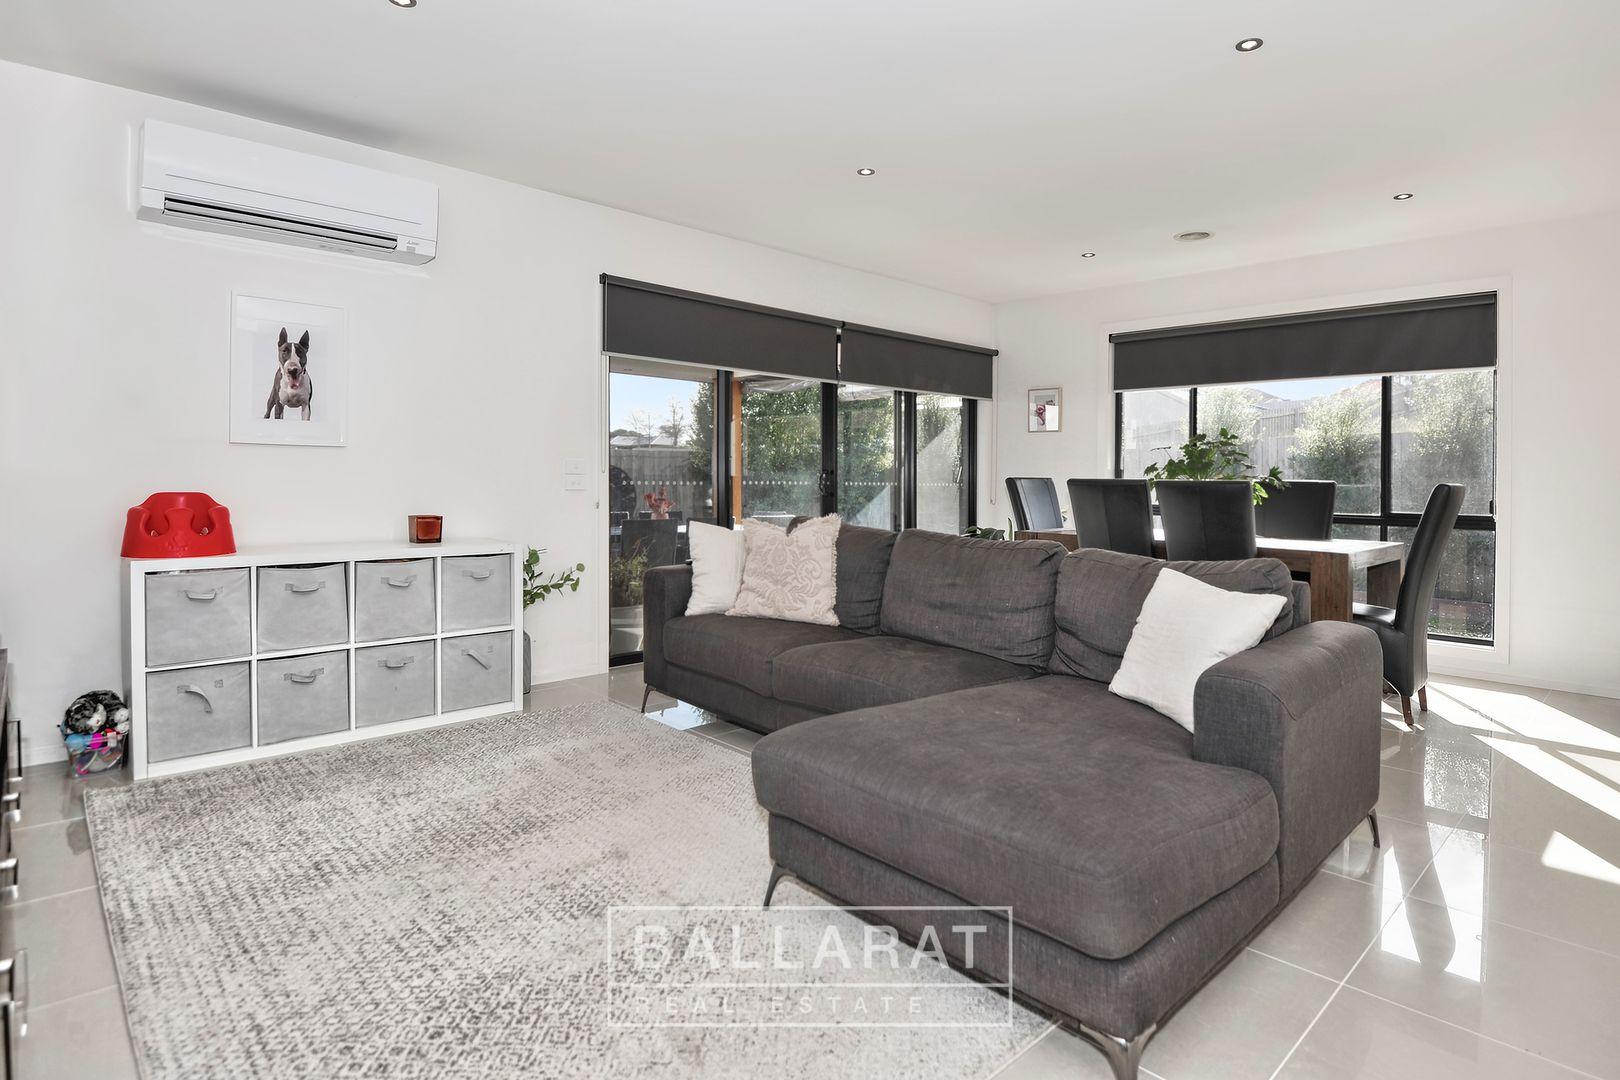 12 Catalina Court, Ballarat East VIC 3350, Image 1